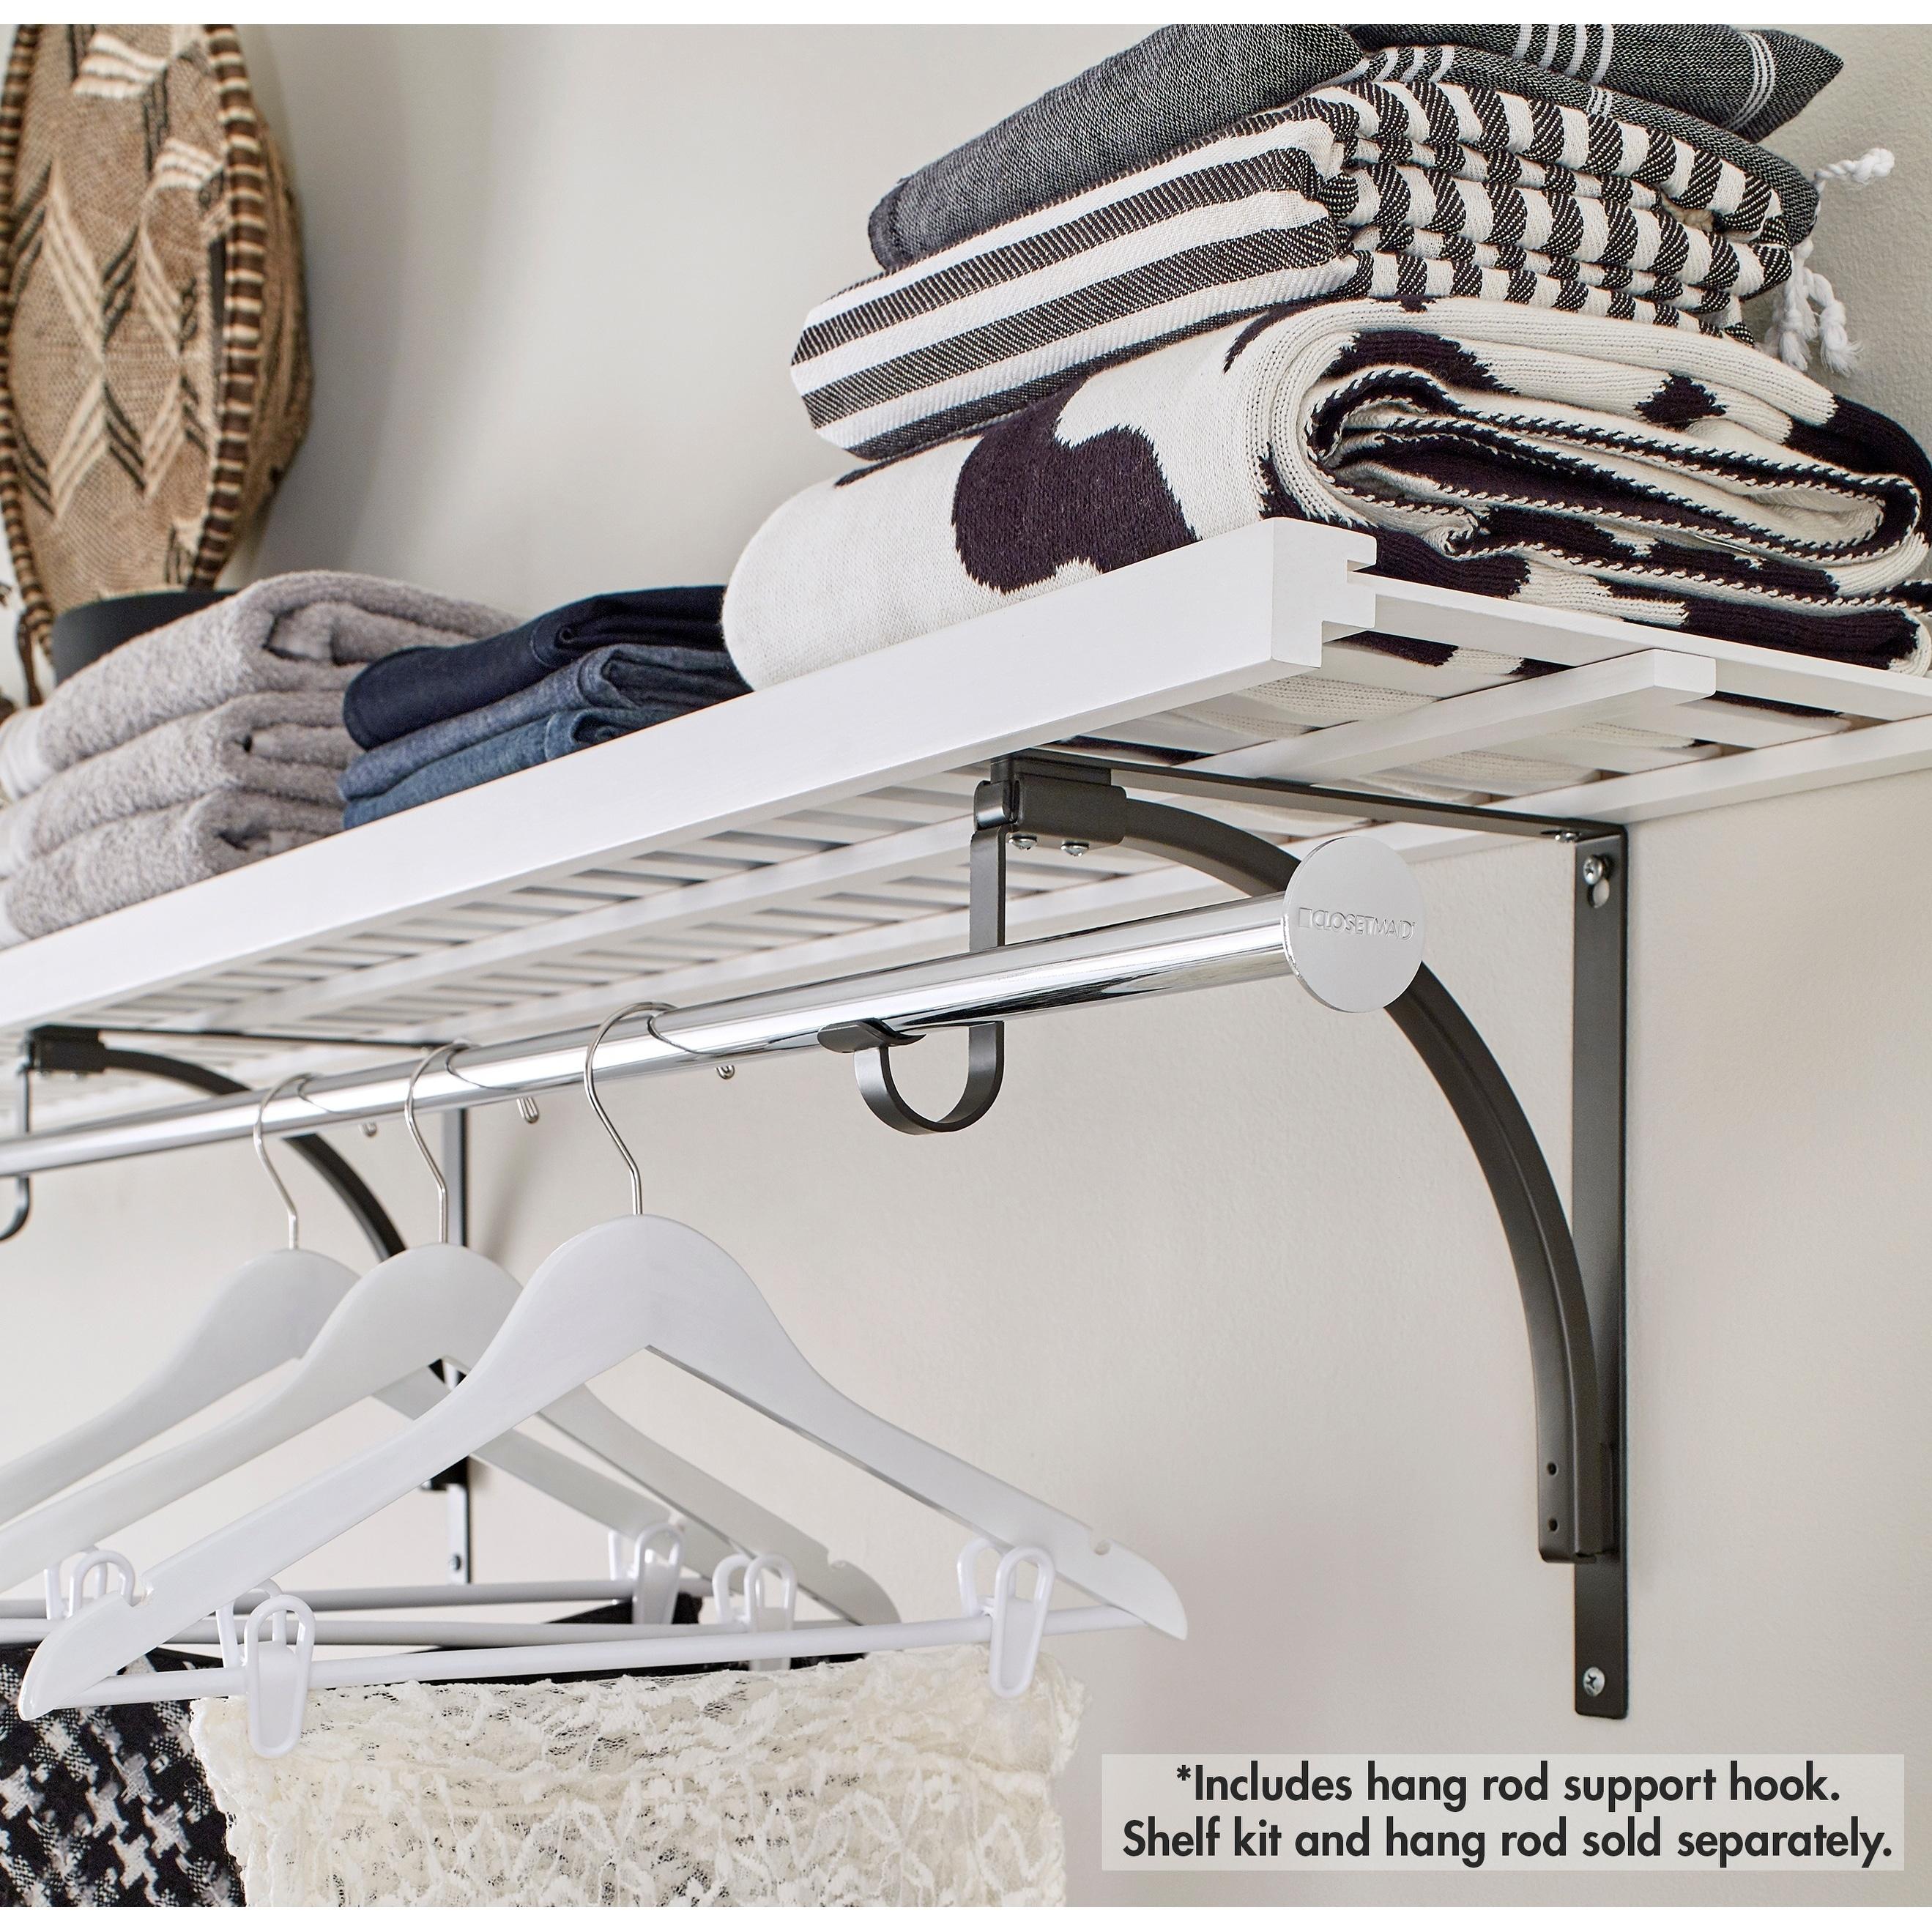 ClosetMaid Premium Shelving Hang Rod Support Hook